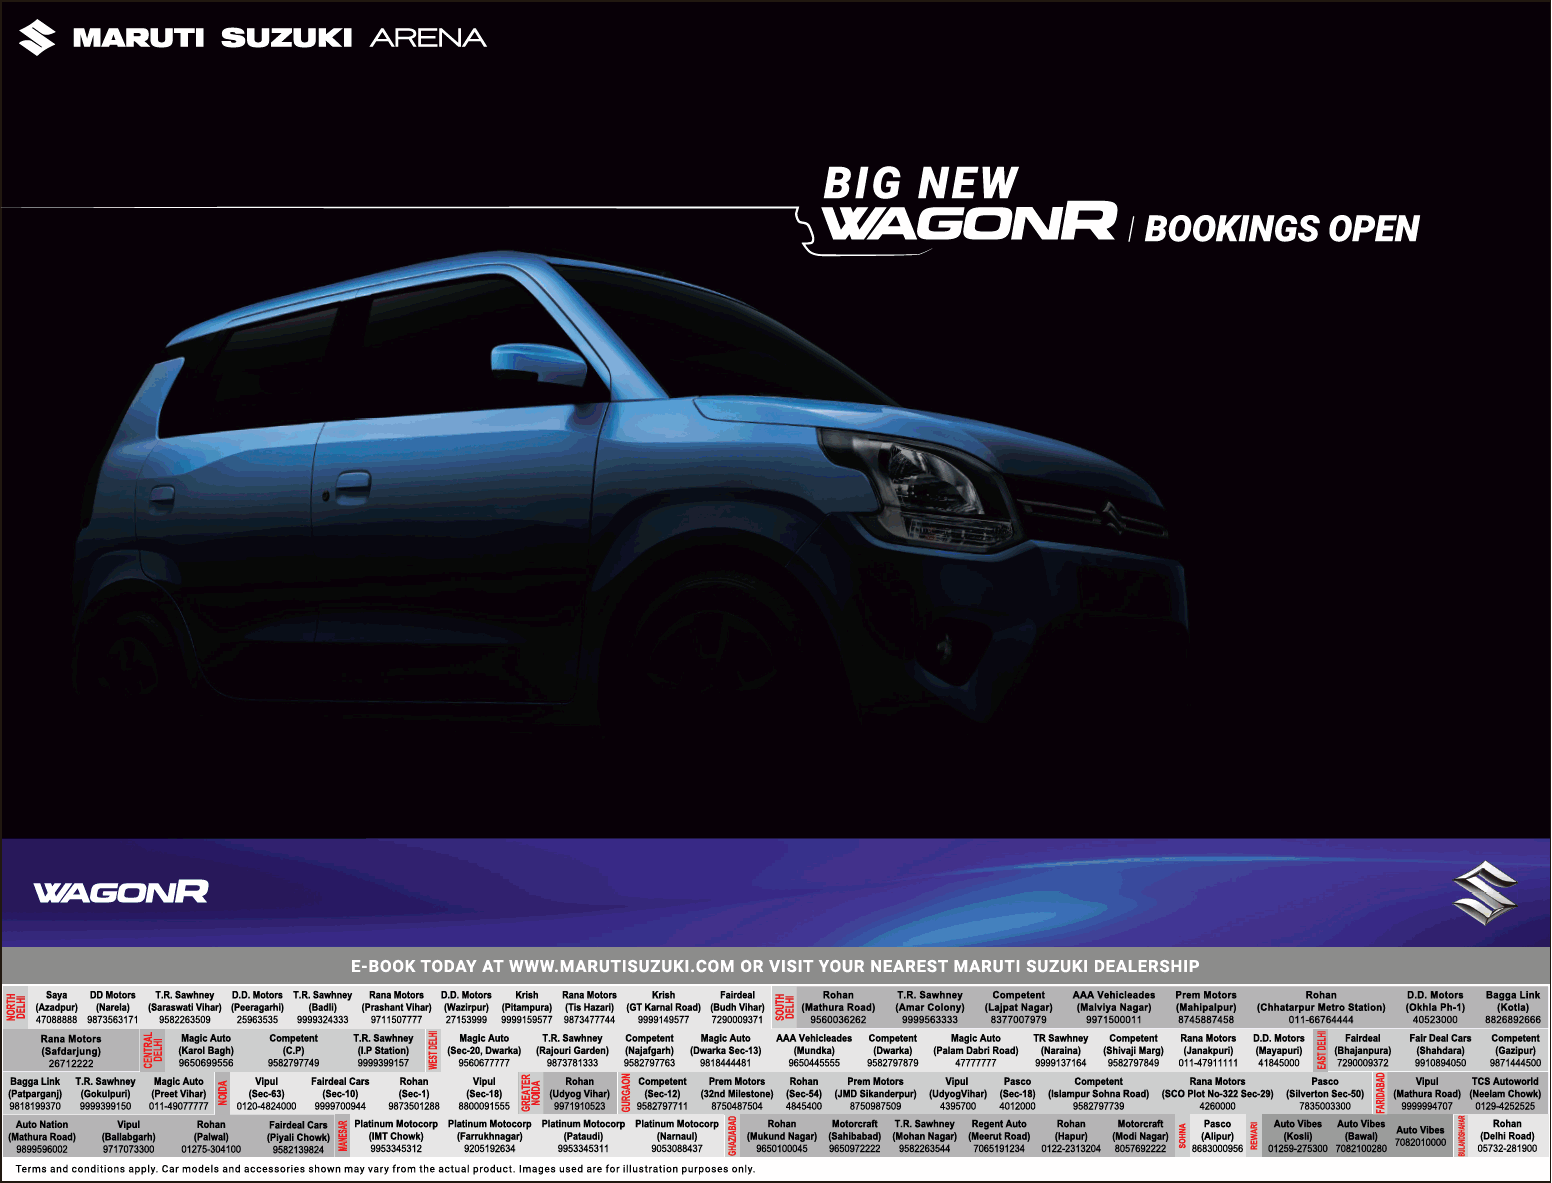 maruti-suzuki-big-new-wagonr-bookings-open-ad-delhi-times-19-01-2019.png